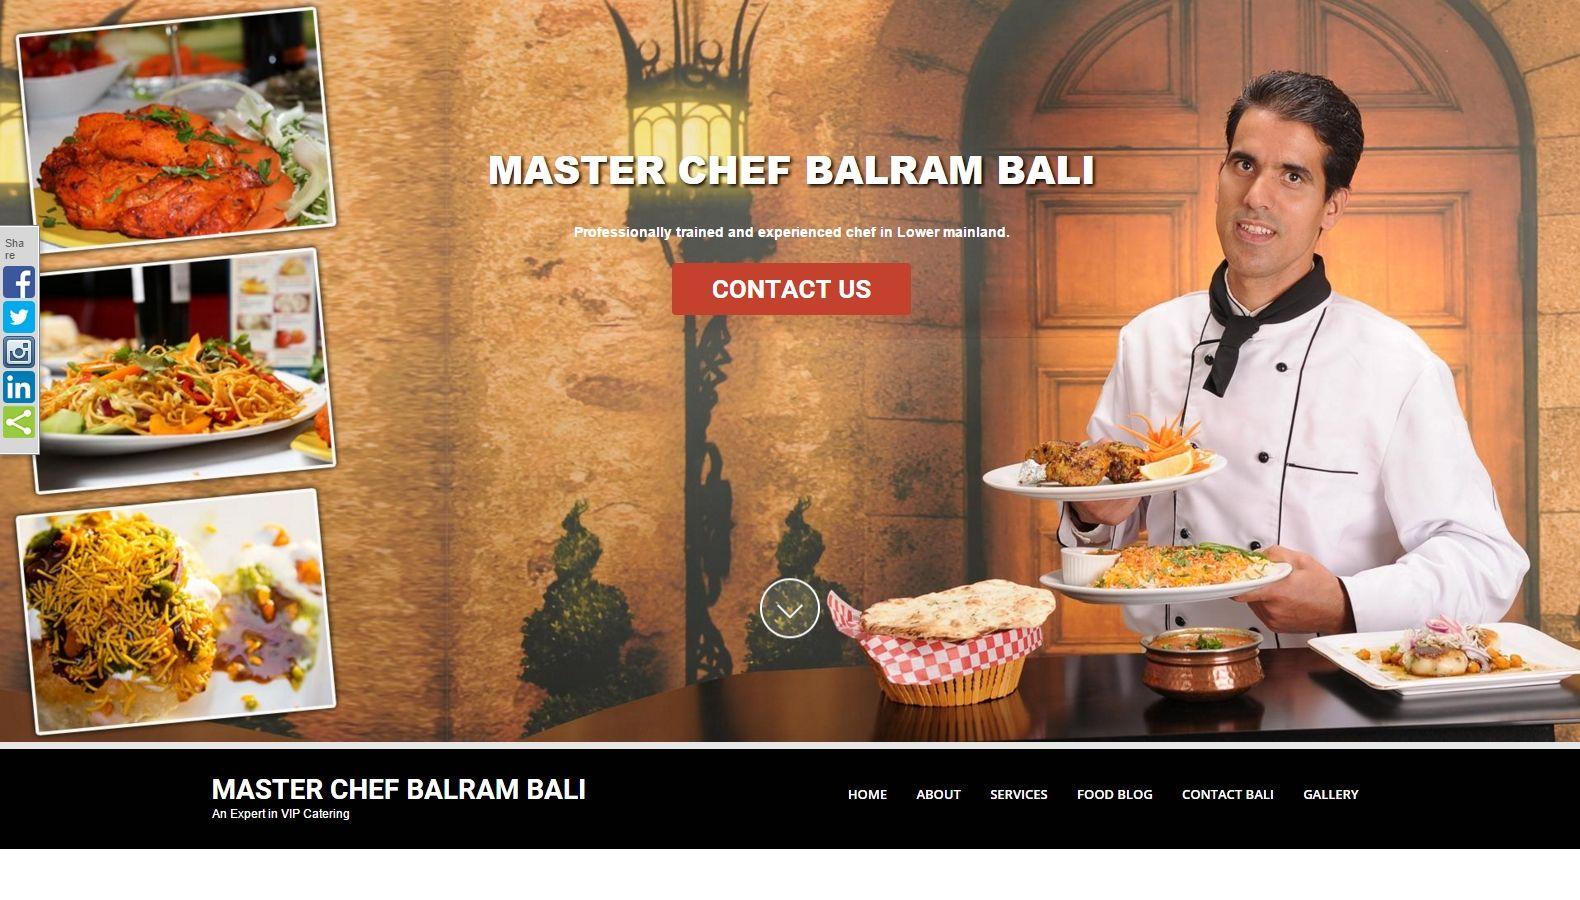 Master Chef Balram Bali - Website Designing By SEOTeam.ca